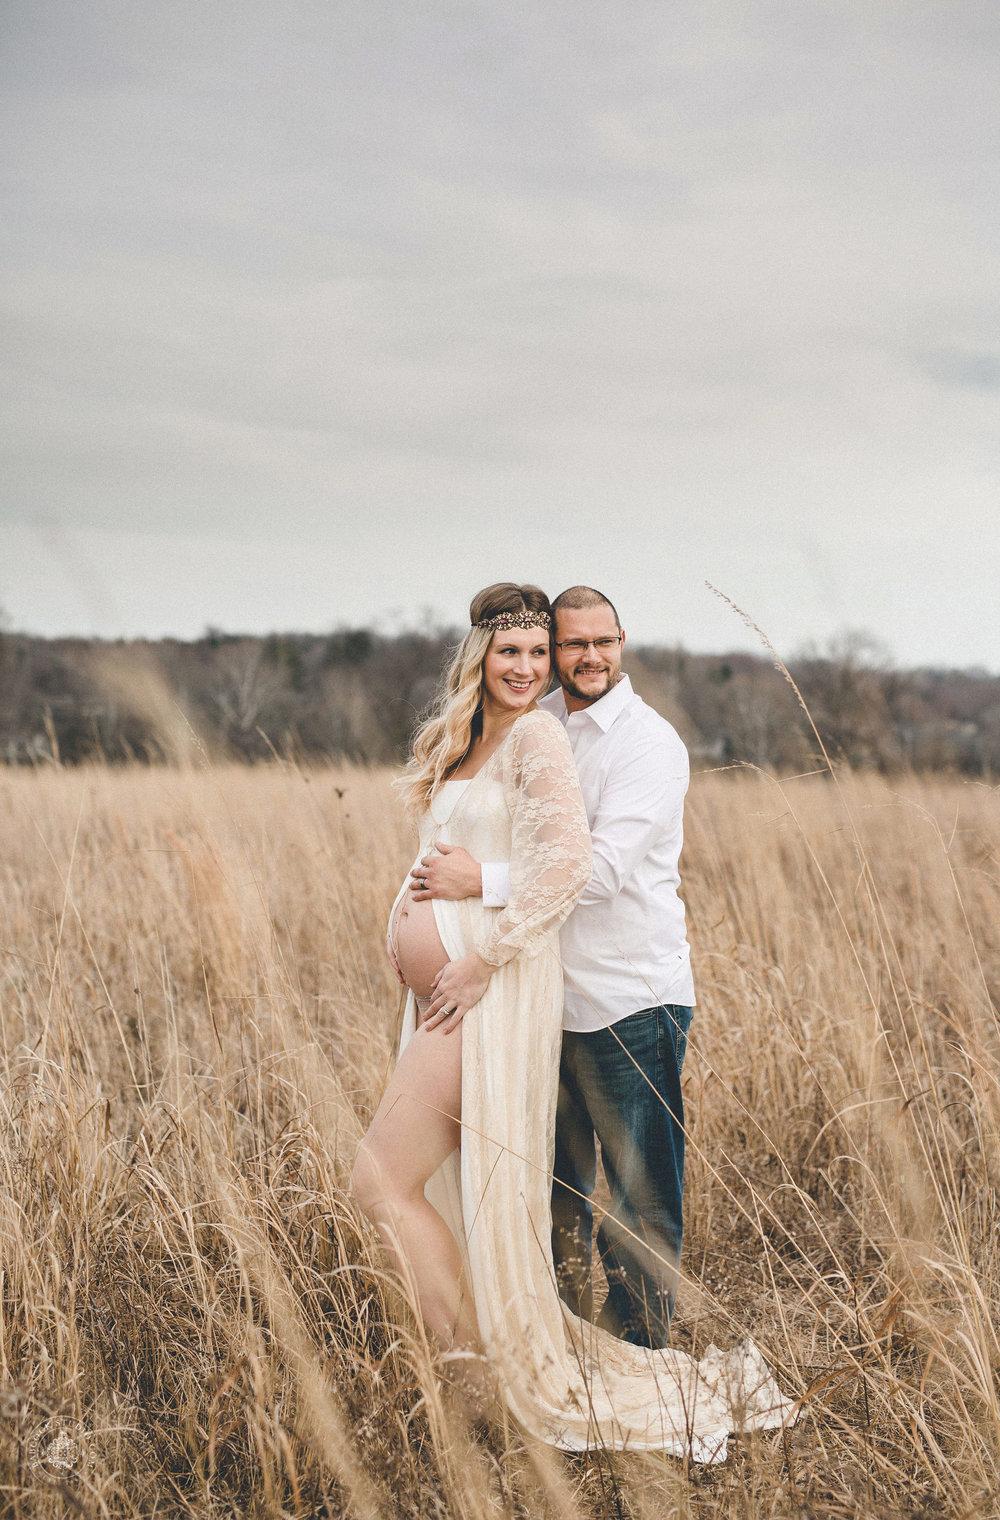 megan-logan-maternity-photographer-dayton-ohio-3.jpg